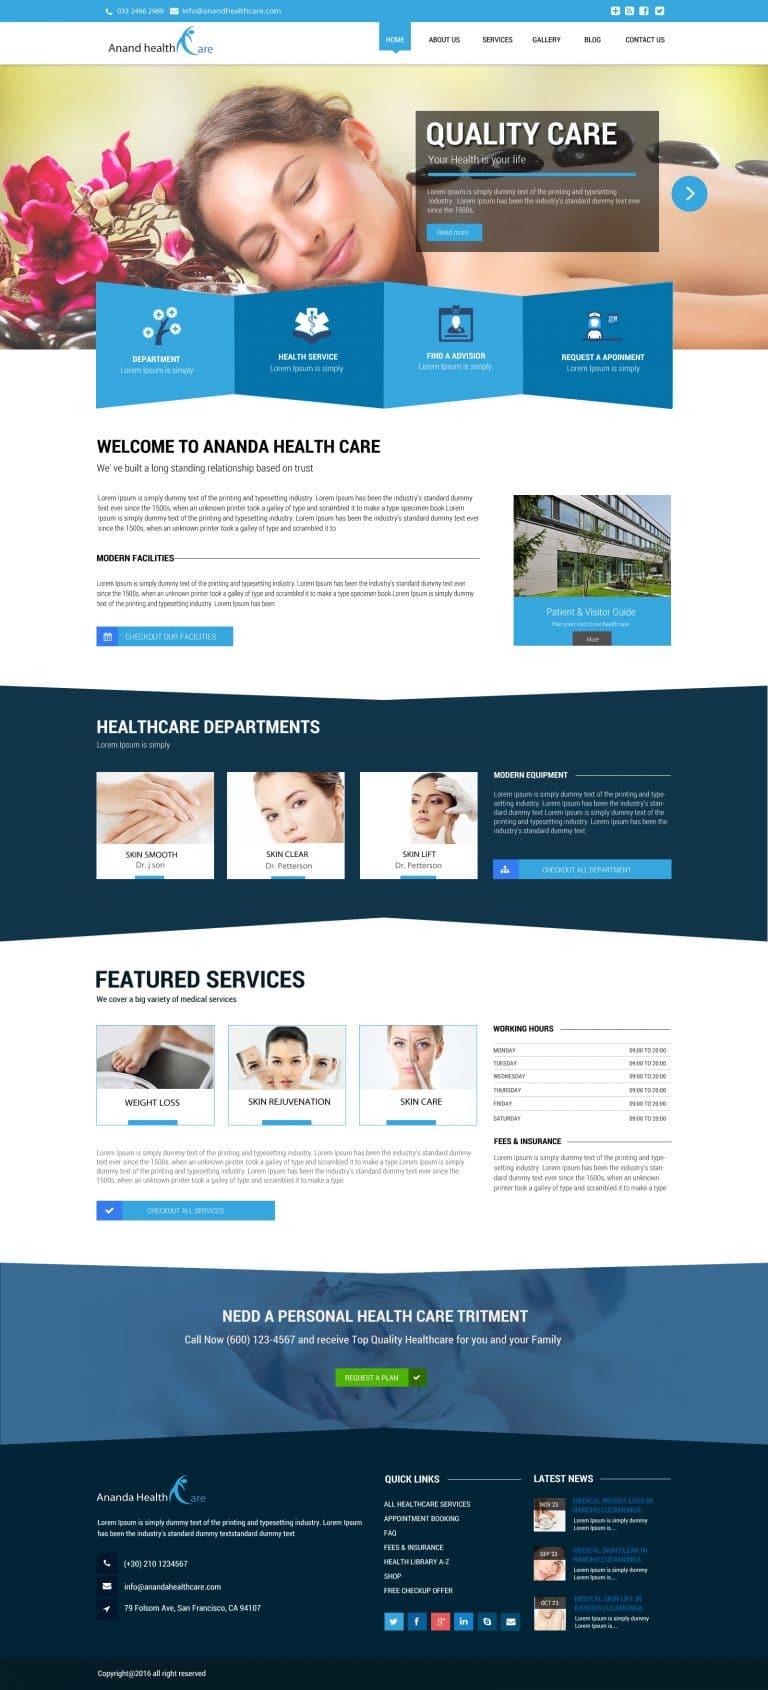 Atanu Das - Remote IT Consultant - Web Design Template #4